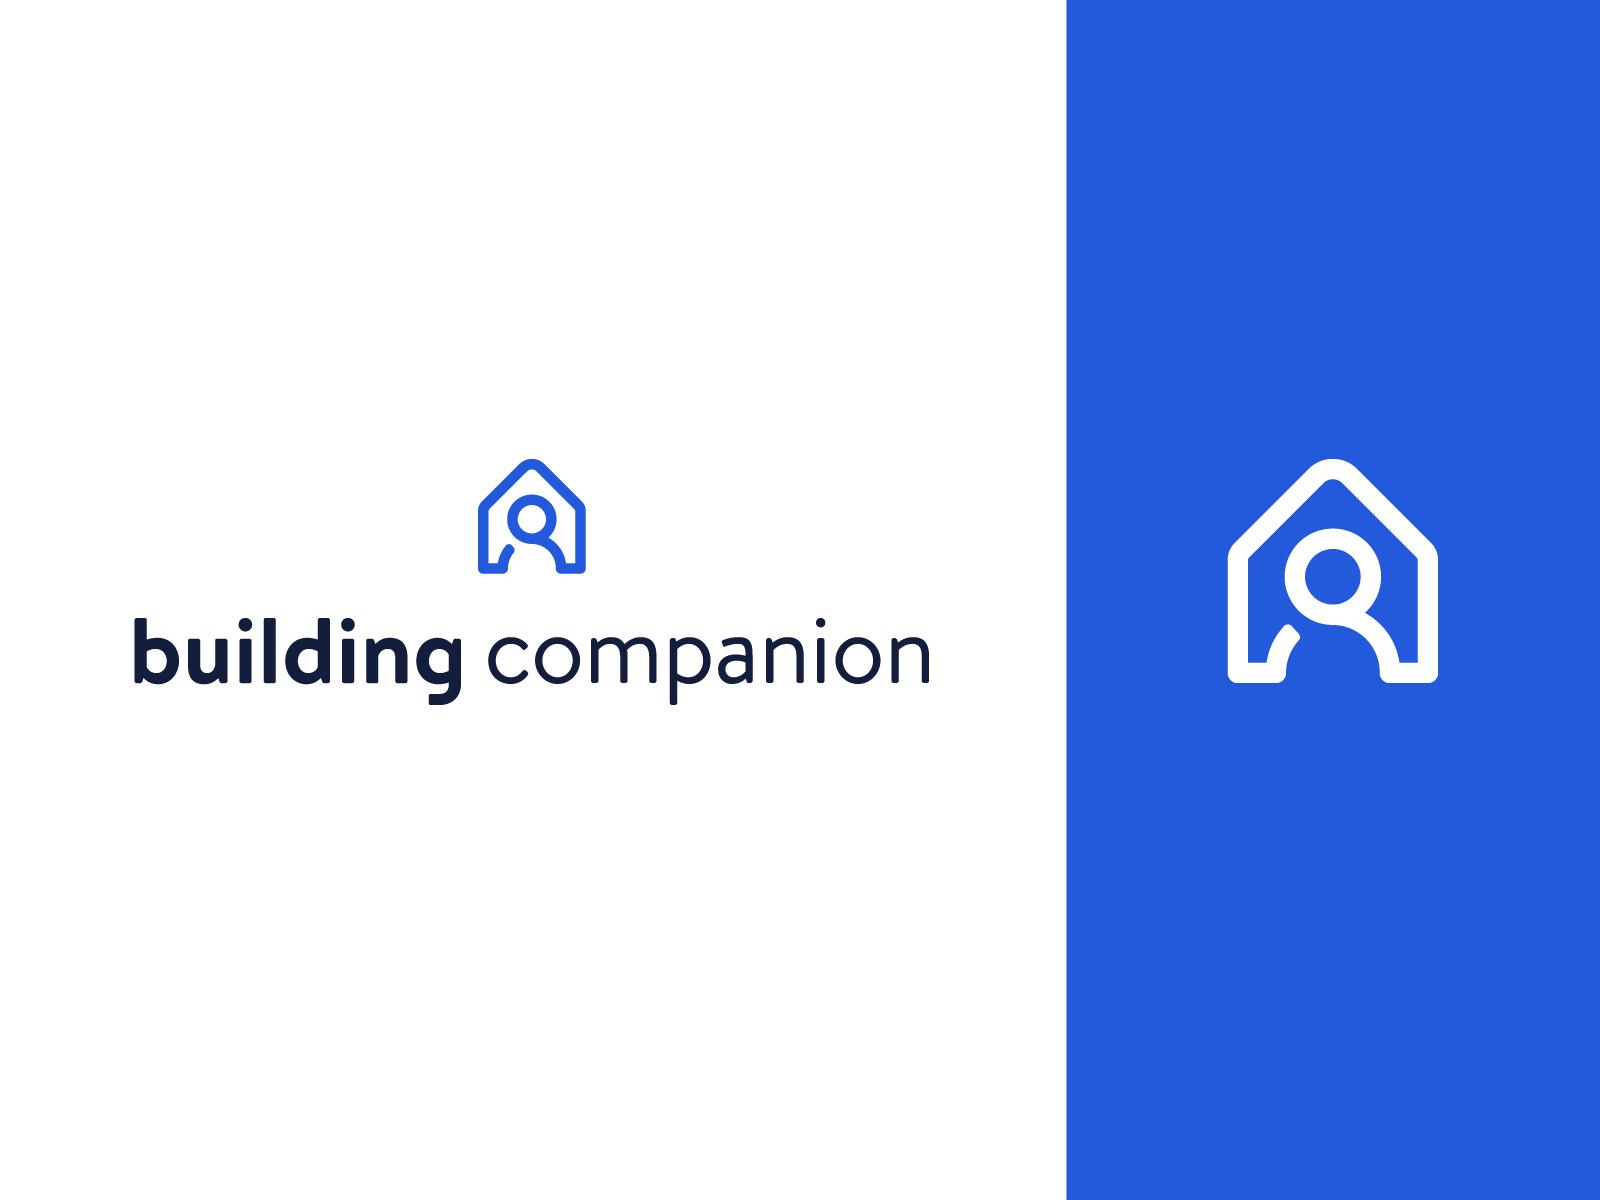 Building Companion People Logo Construction Branding Logo Design